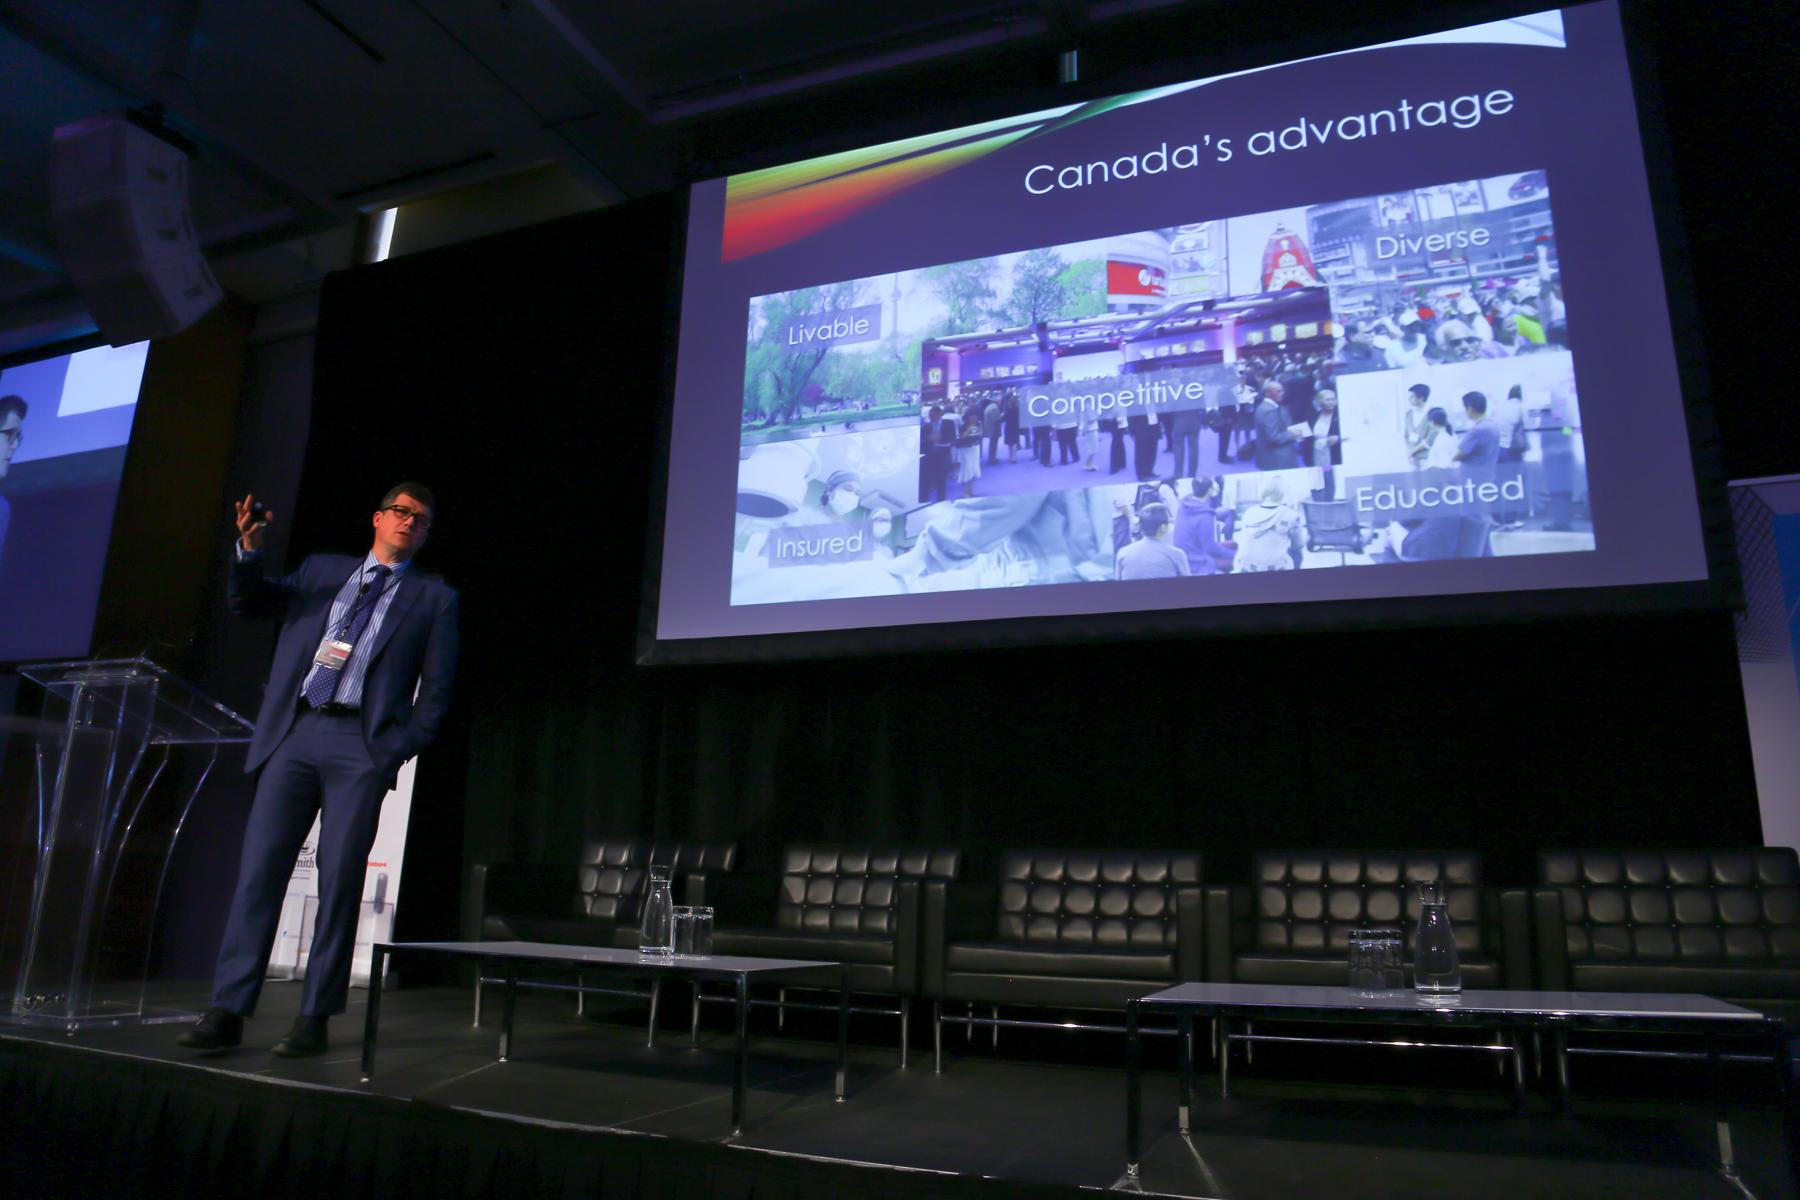 ABD_Conference_2018-086.jpg